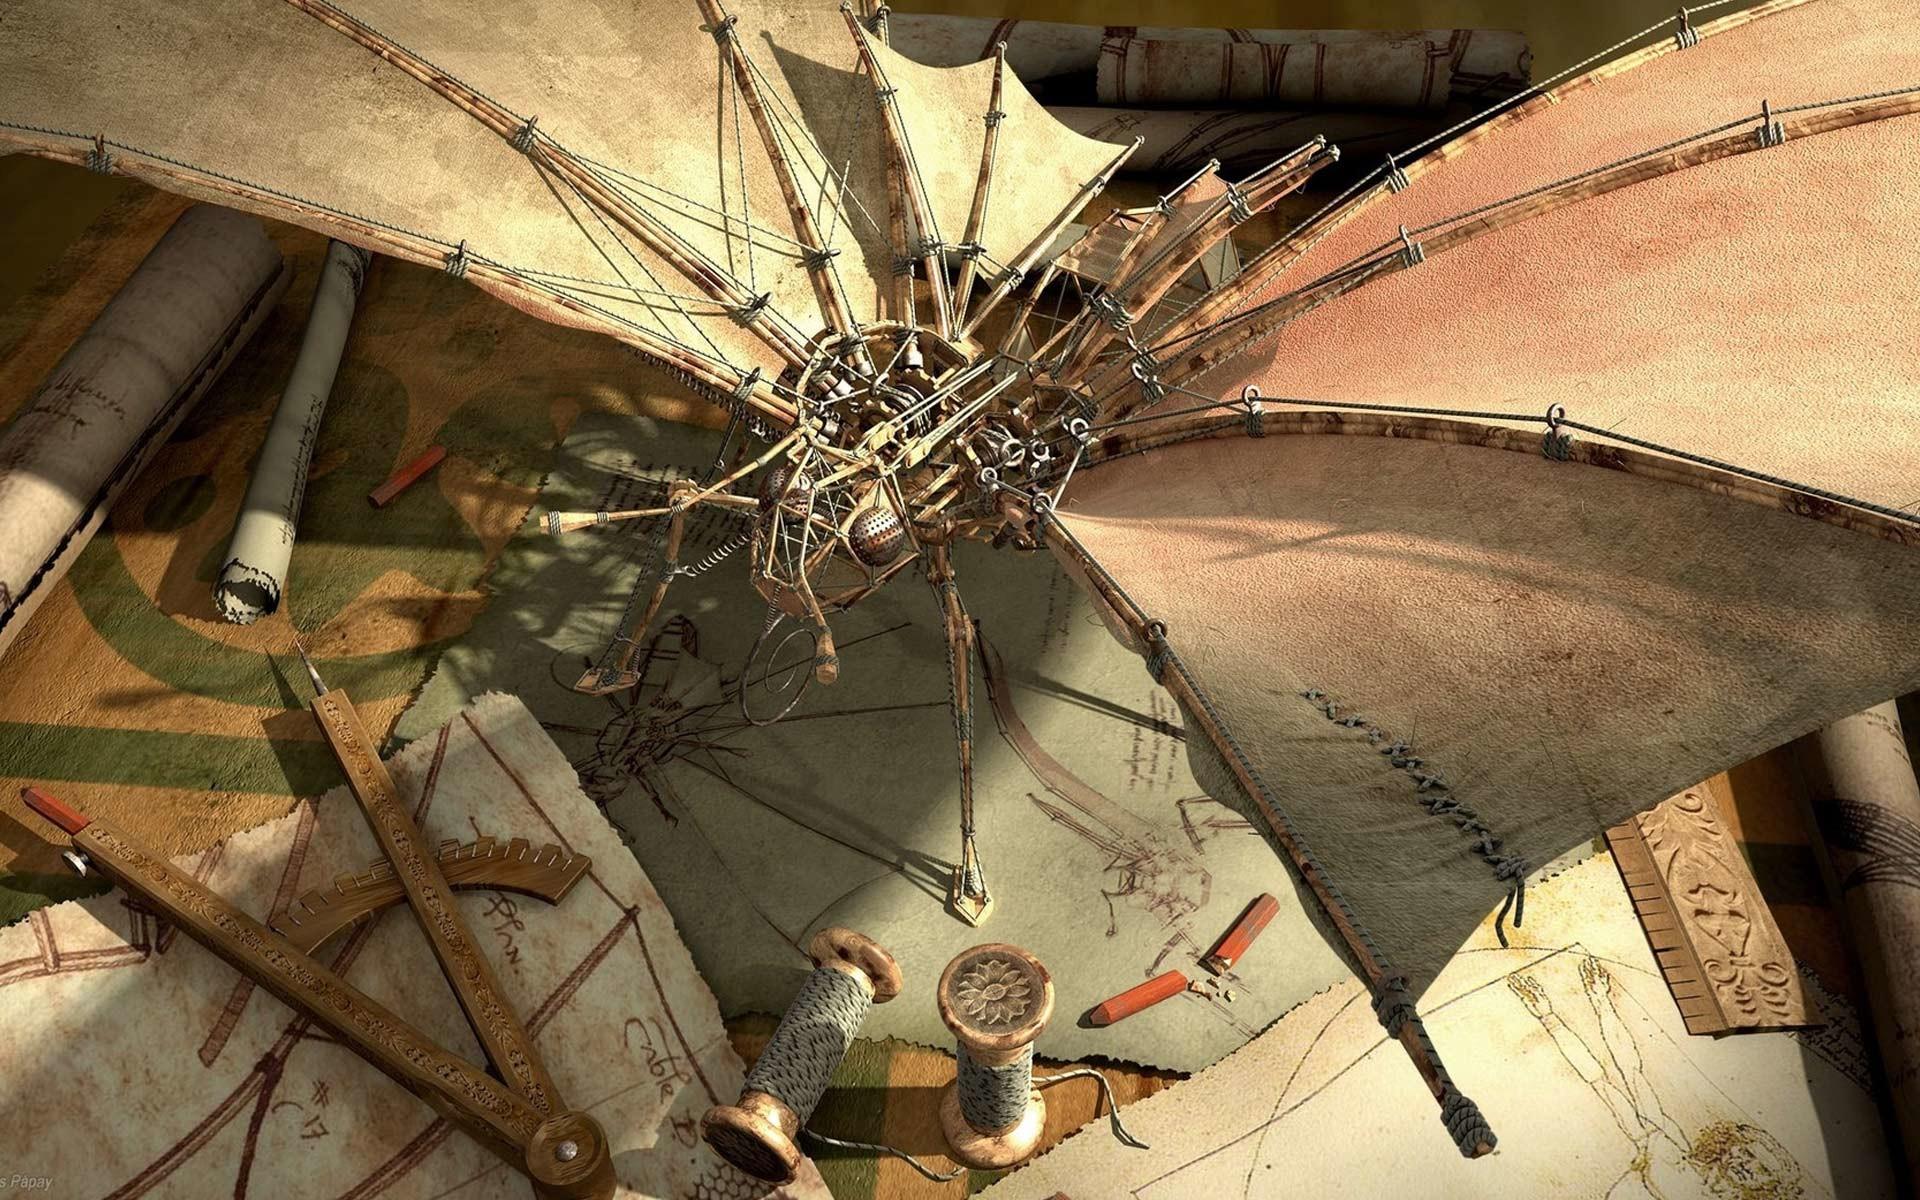 Desktop Wallpaper · Gallery · 3D-Art · Leonardo da Vinci workshop .